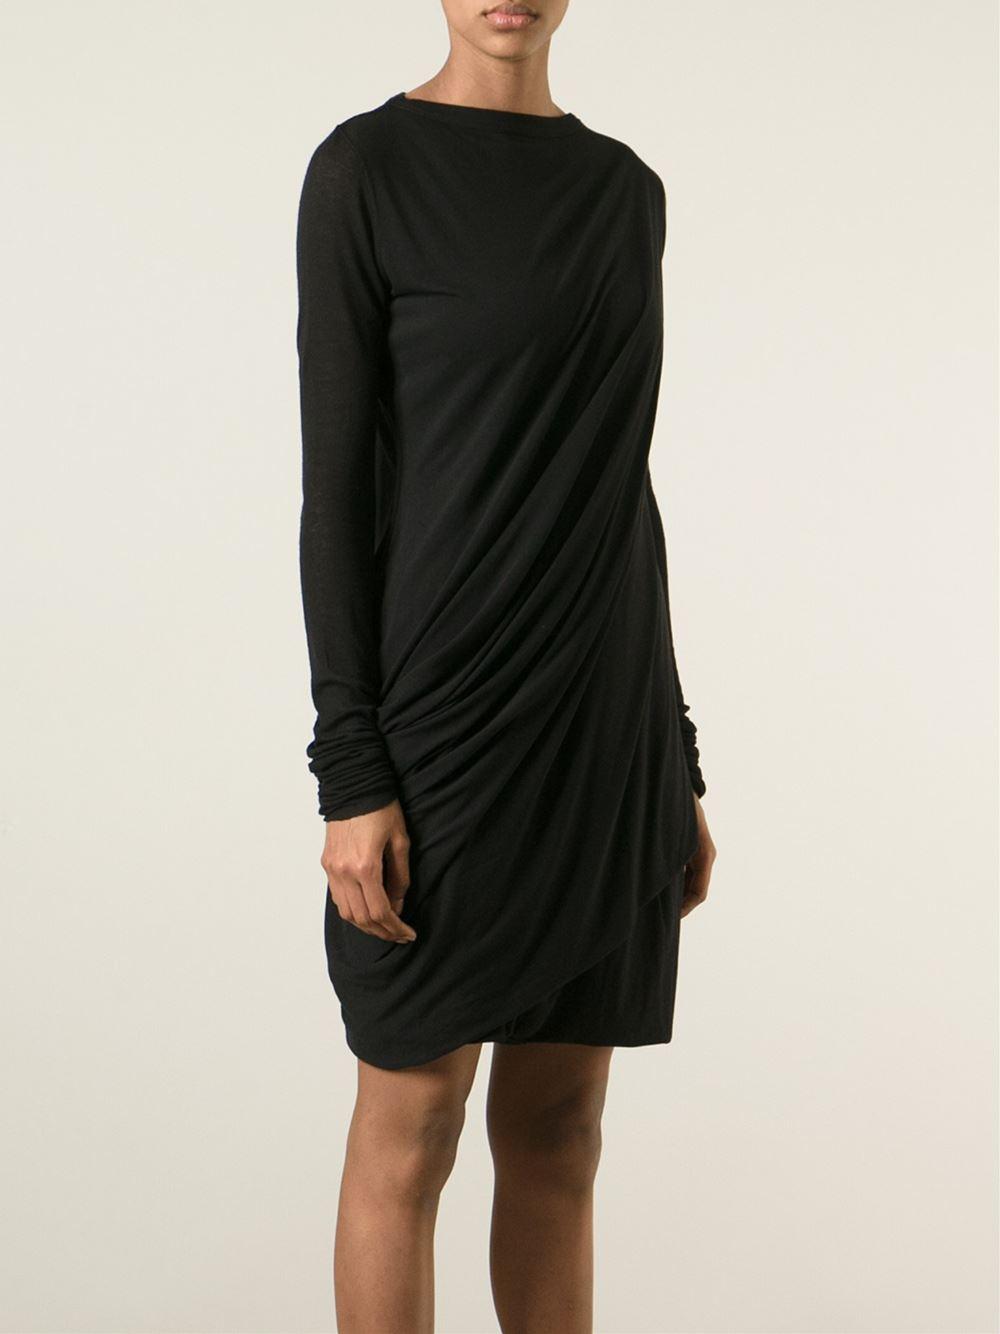 tunic dress Rick Owens AhnSB8ztR